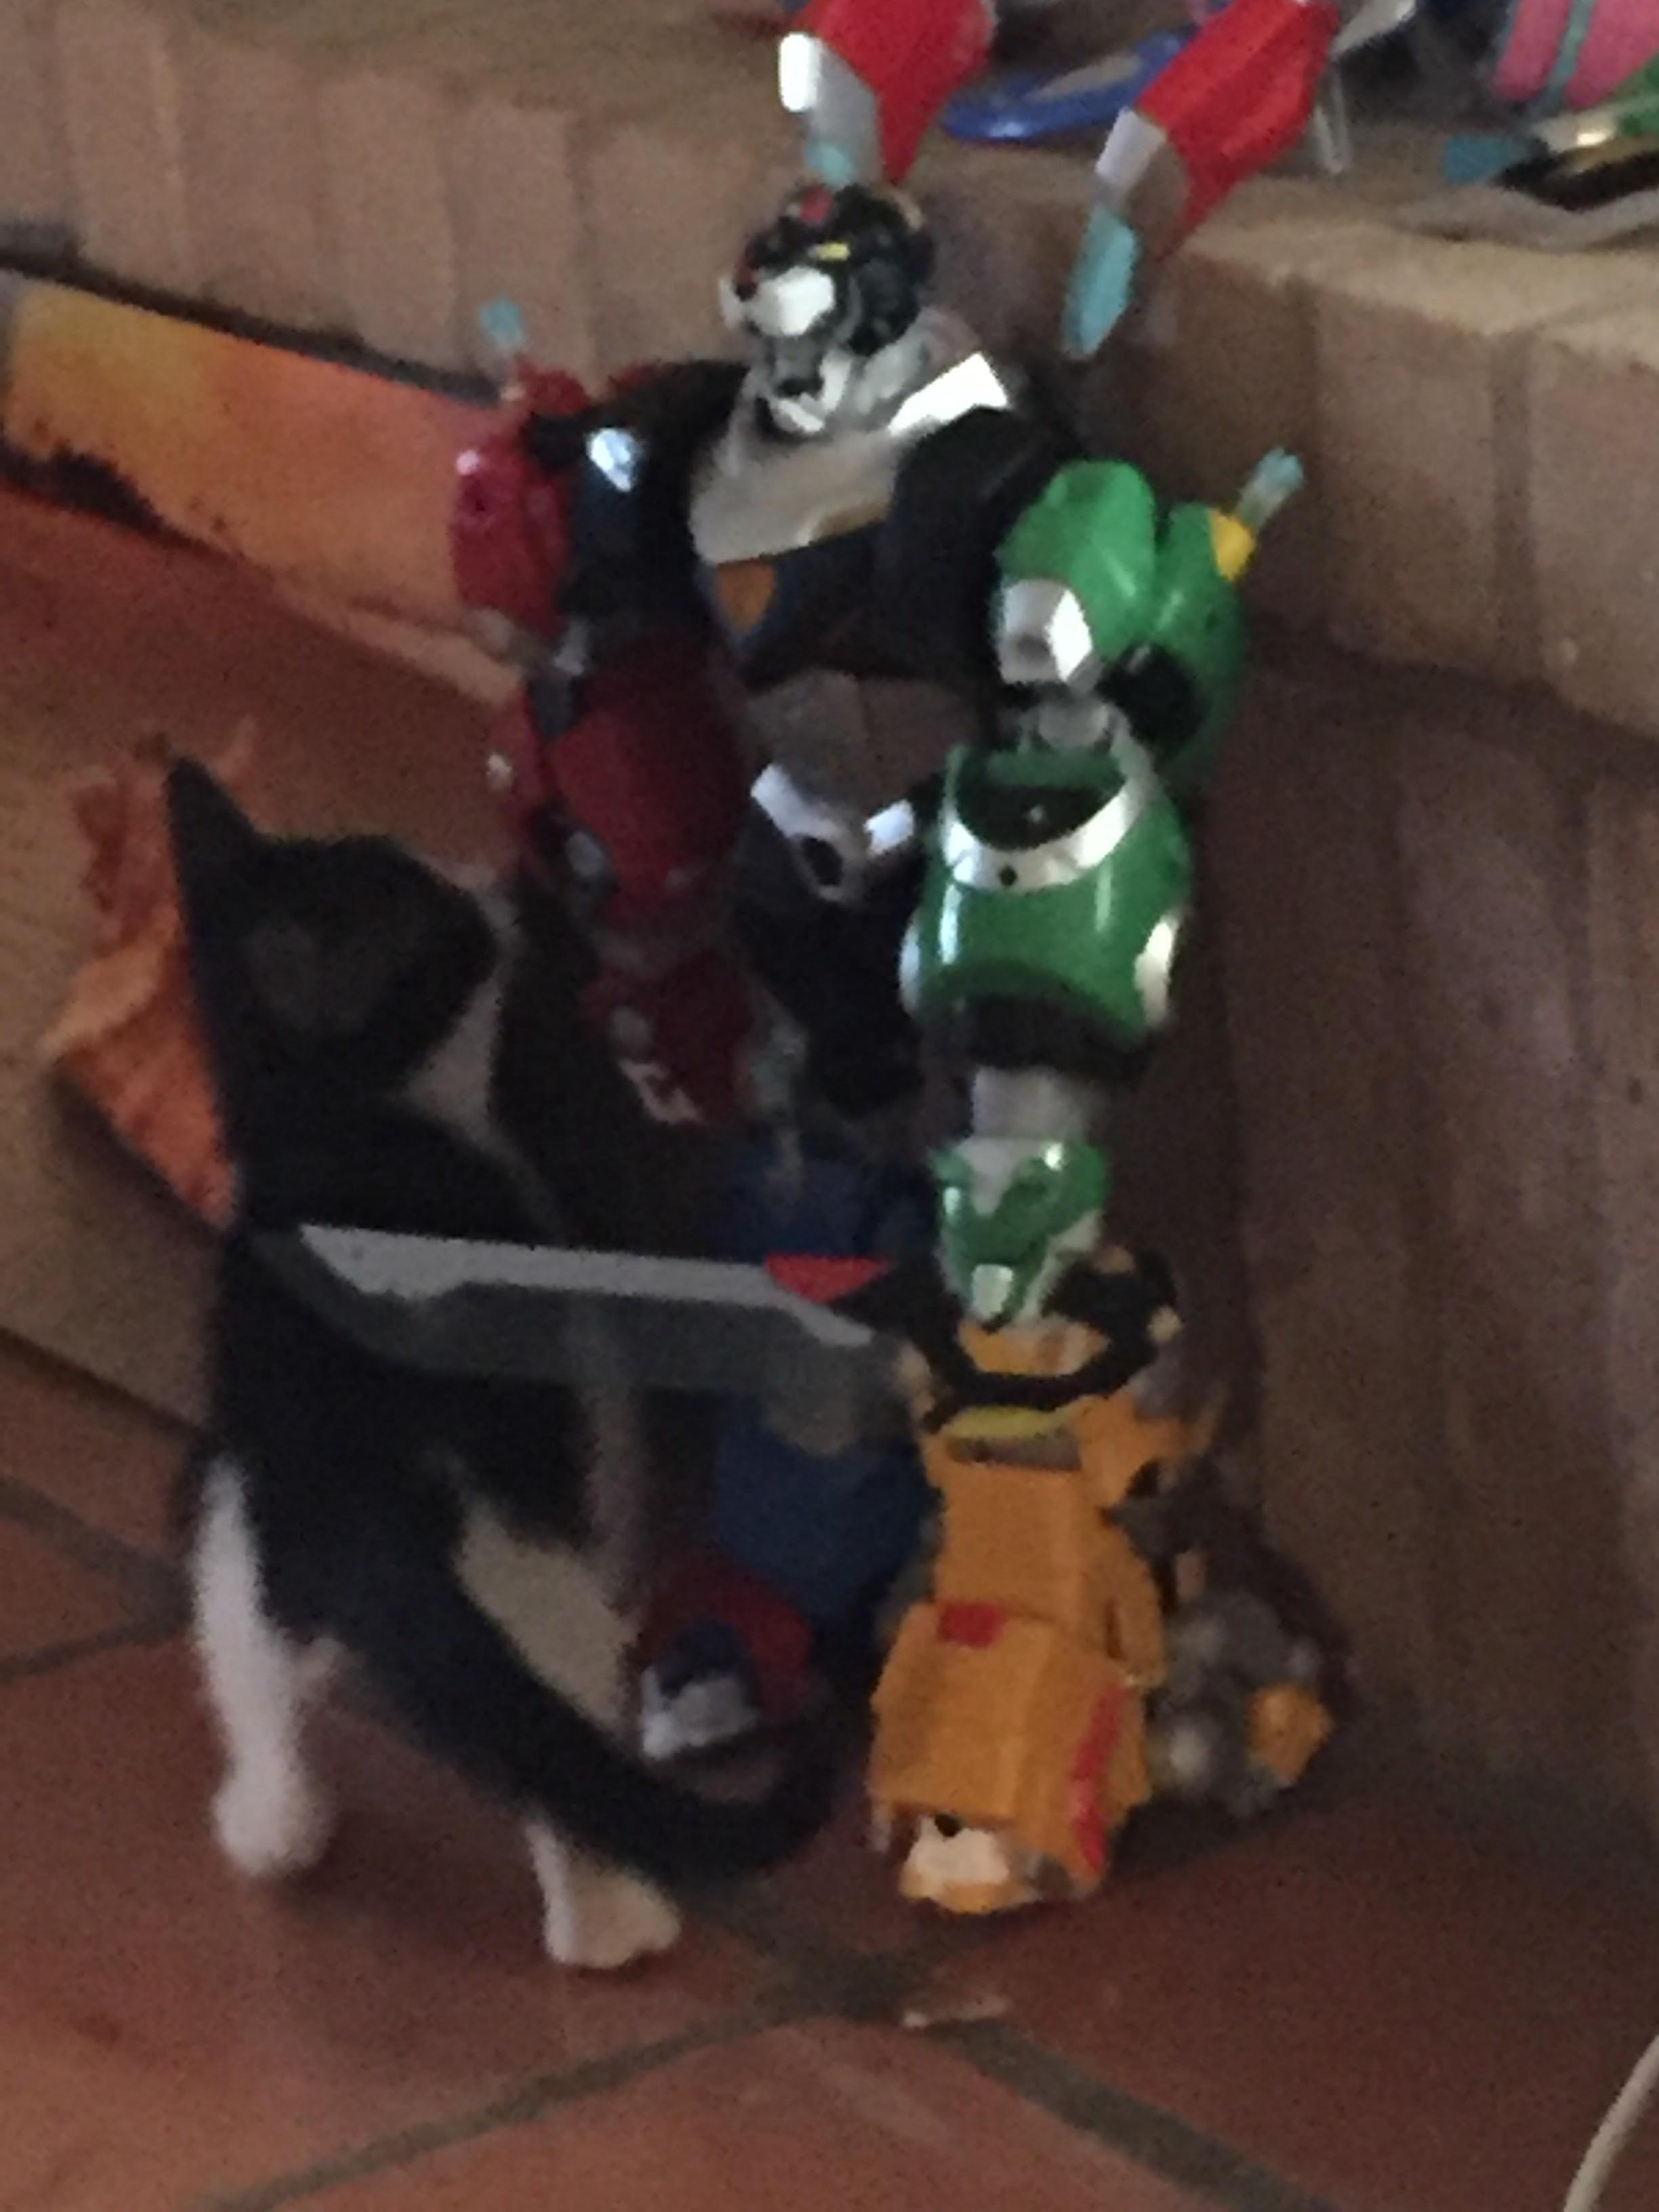 Oreo sizing up Voltron. http://ift.tt/2rt4dmn